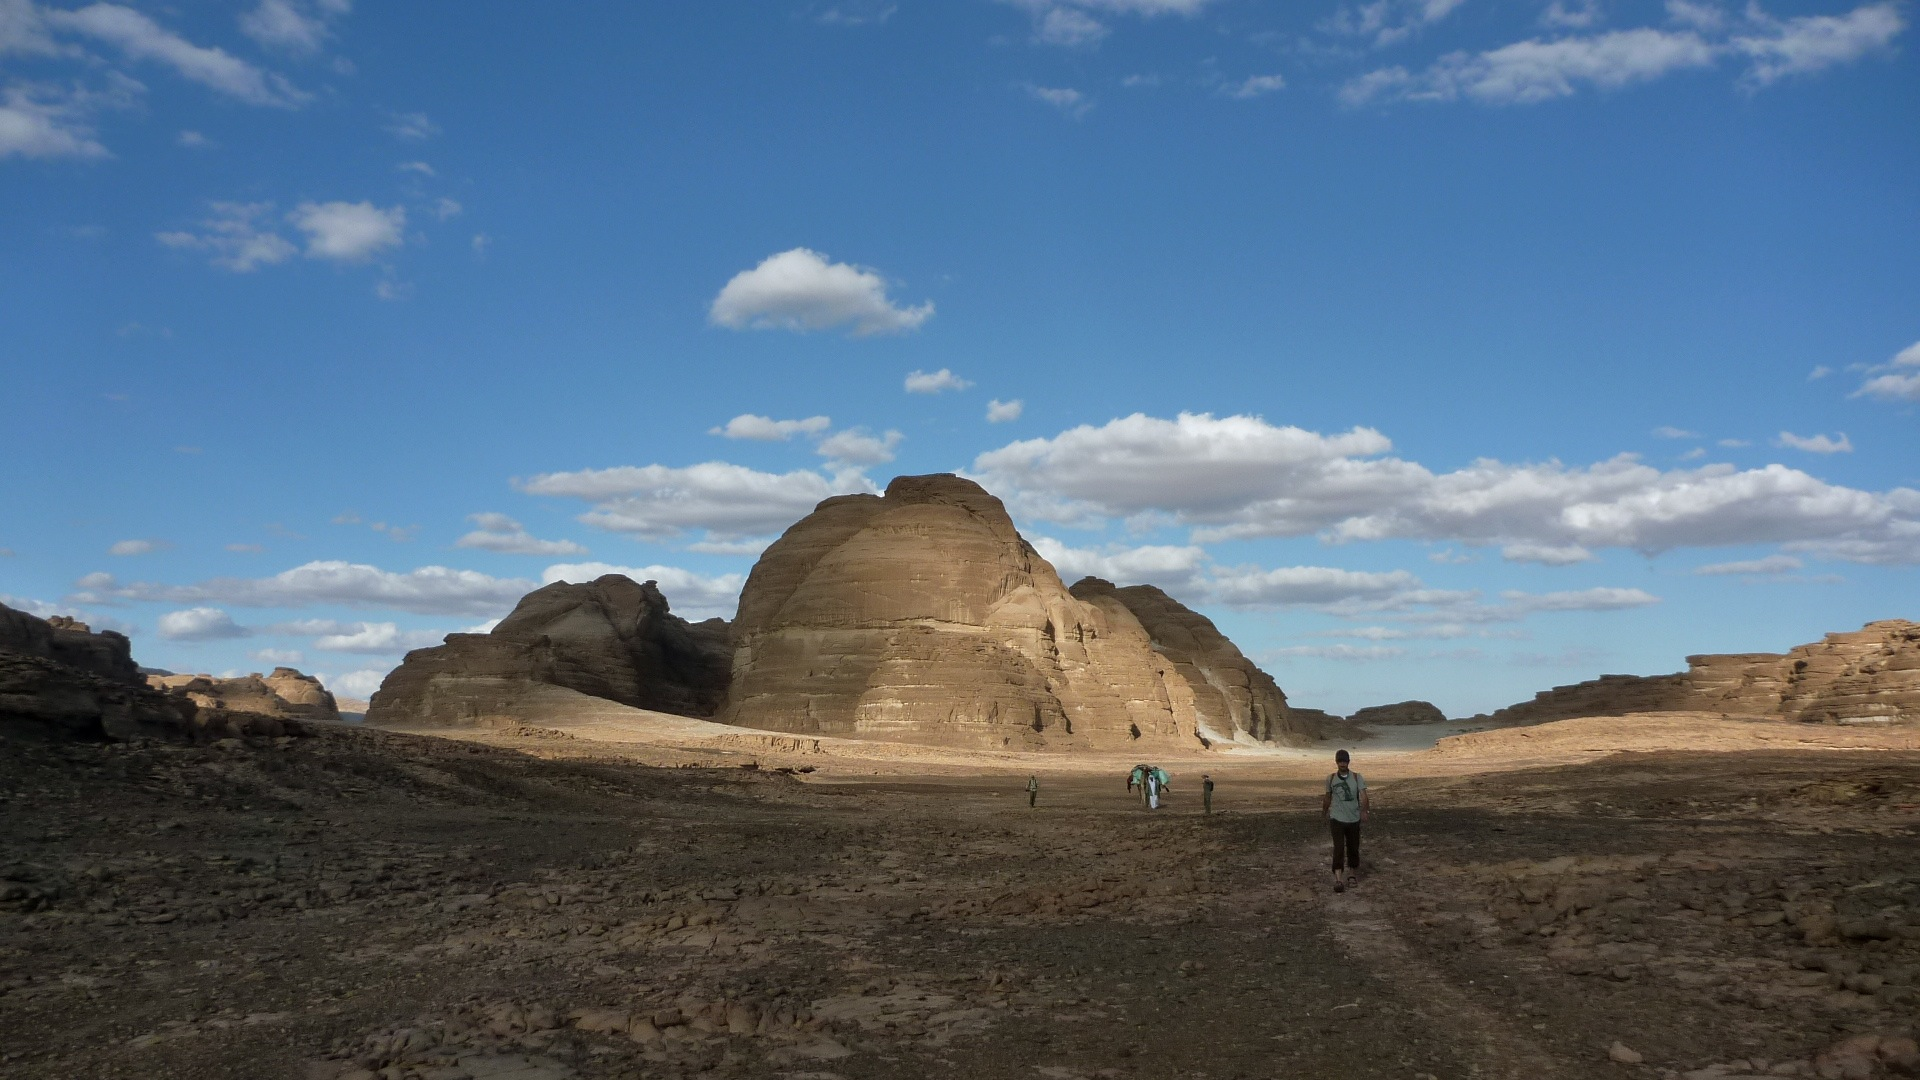 Trekking the deserts of South Sinai near the sandstone peaks of Jebel Mutamir